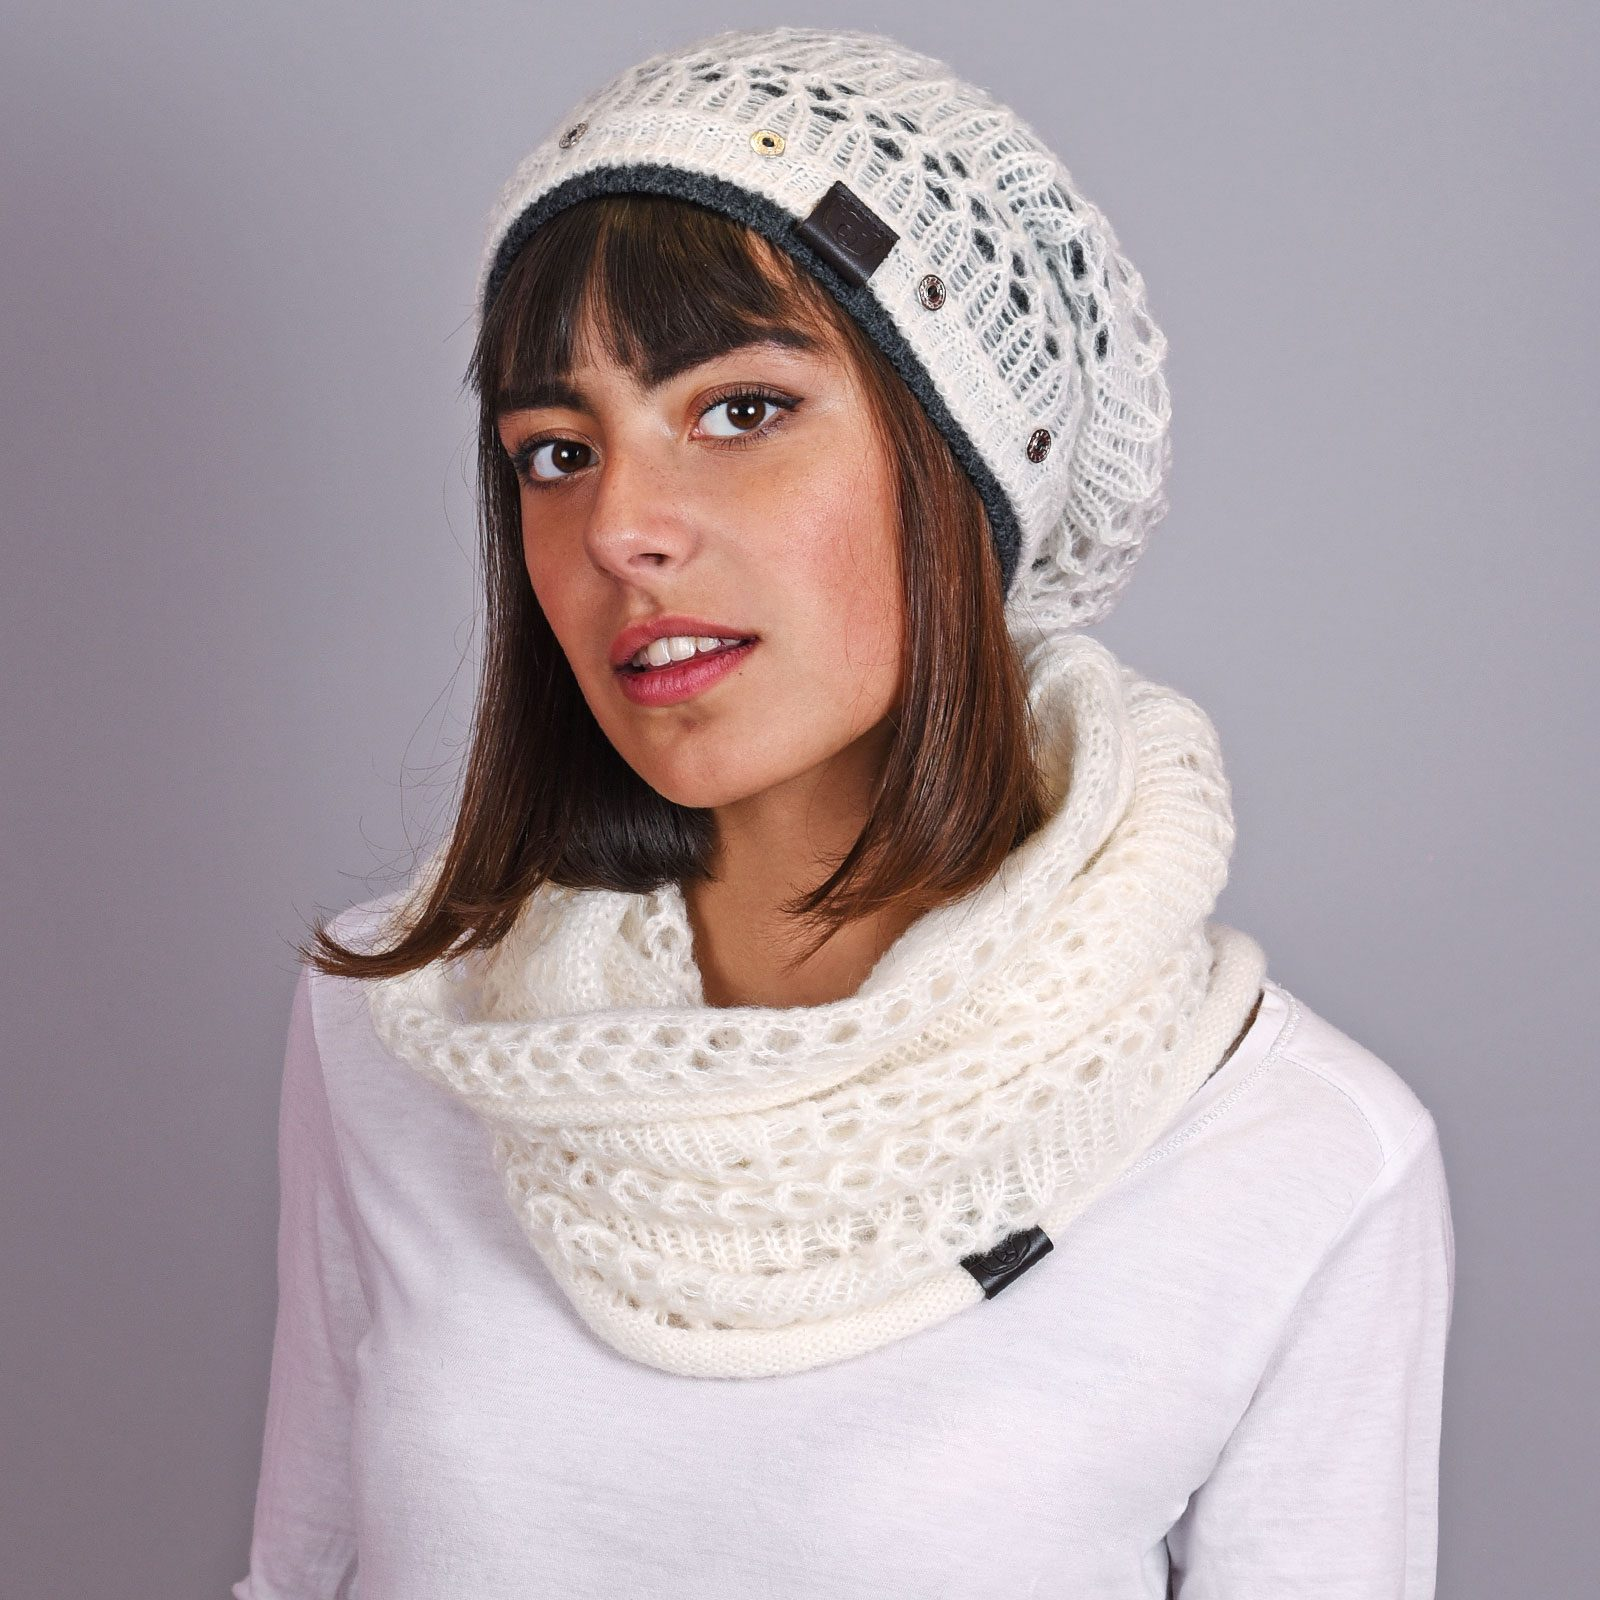 http://lookbook.allee-du-foulard.fr/wp-content/uploads/2018/12/AT-04593-VF16-ensemble-snood-bonnet-long-blanc-1600x1600.jpg